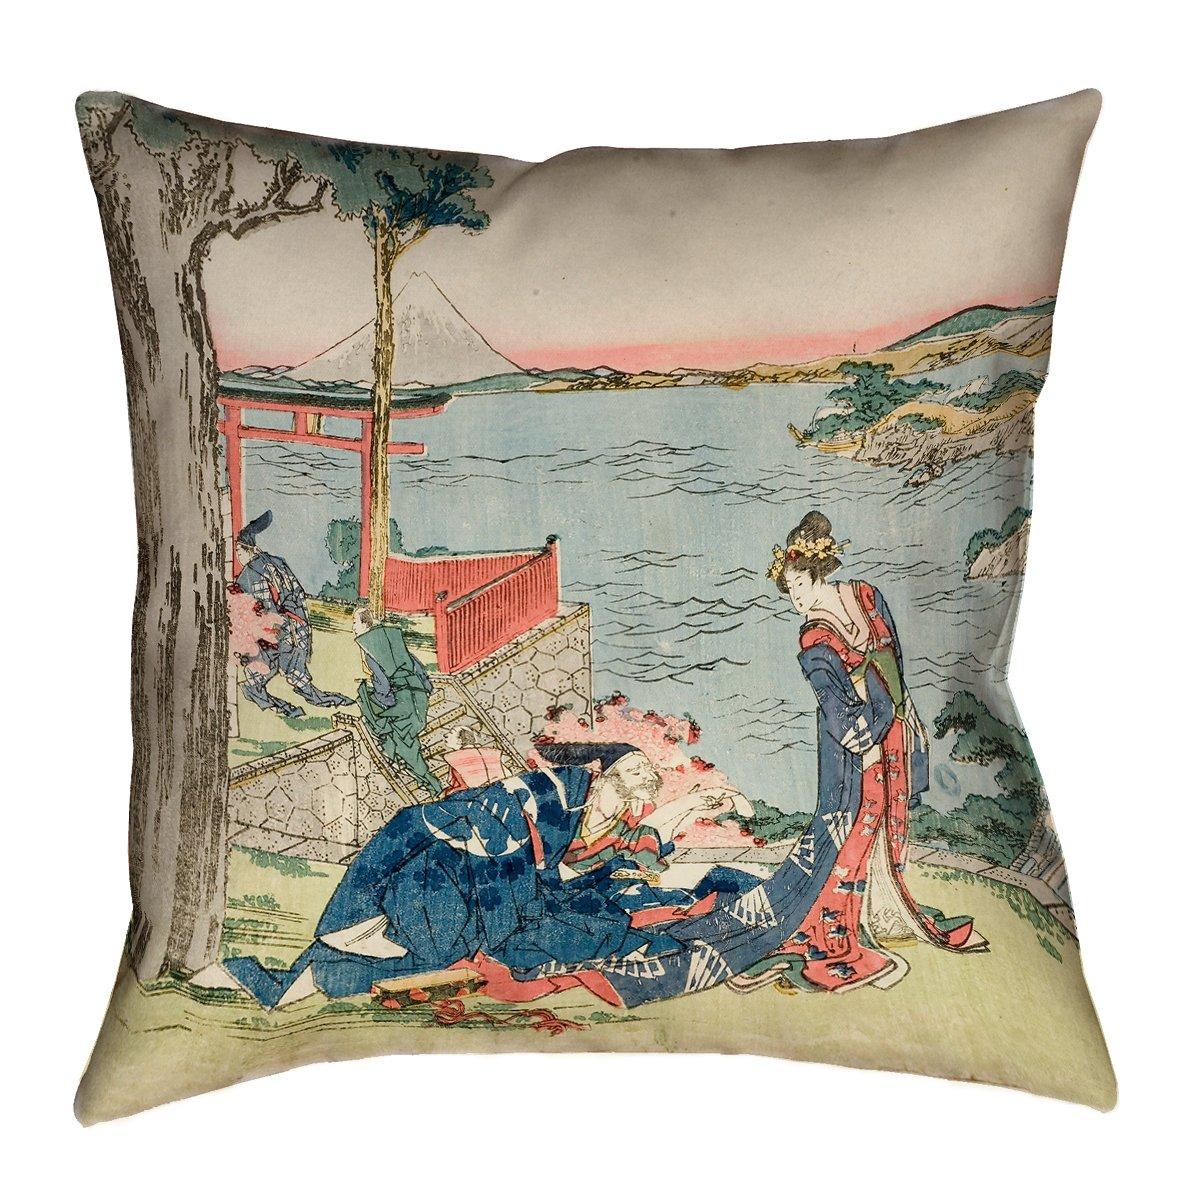 ArtVerse Katsushika Hokusai 14 x 14 Spun Polyester Double Sided Print with Concealed Zipper /& Insert Japanese Courtesan Pillow 14 x 14 14 x 14